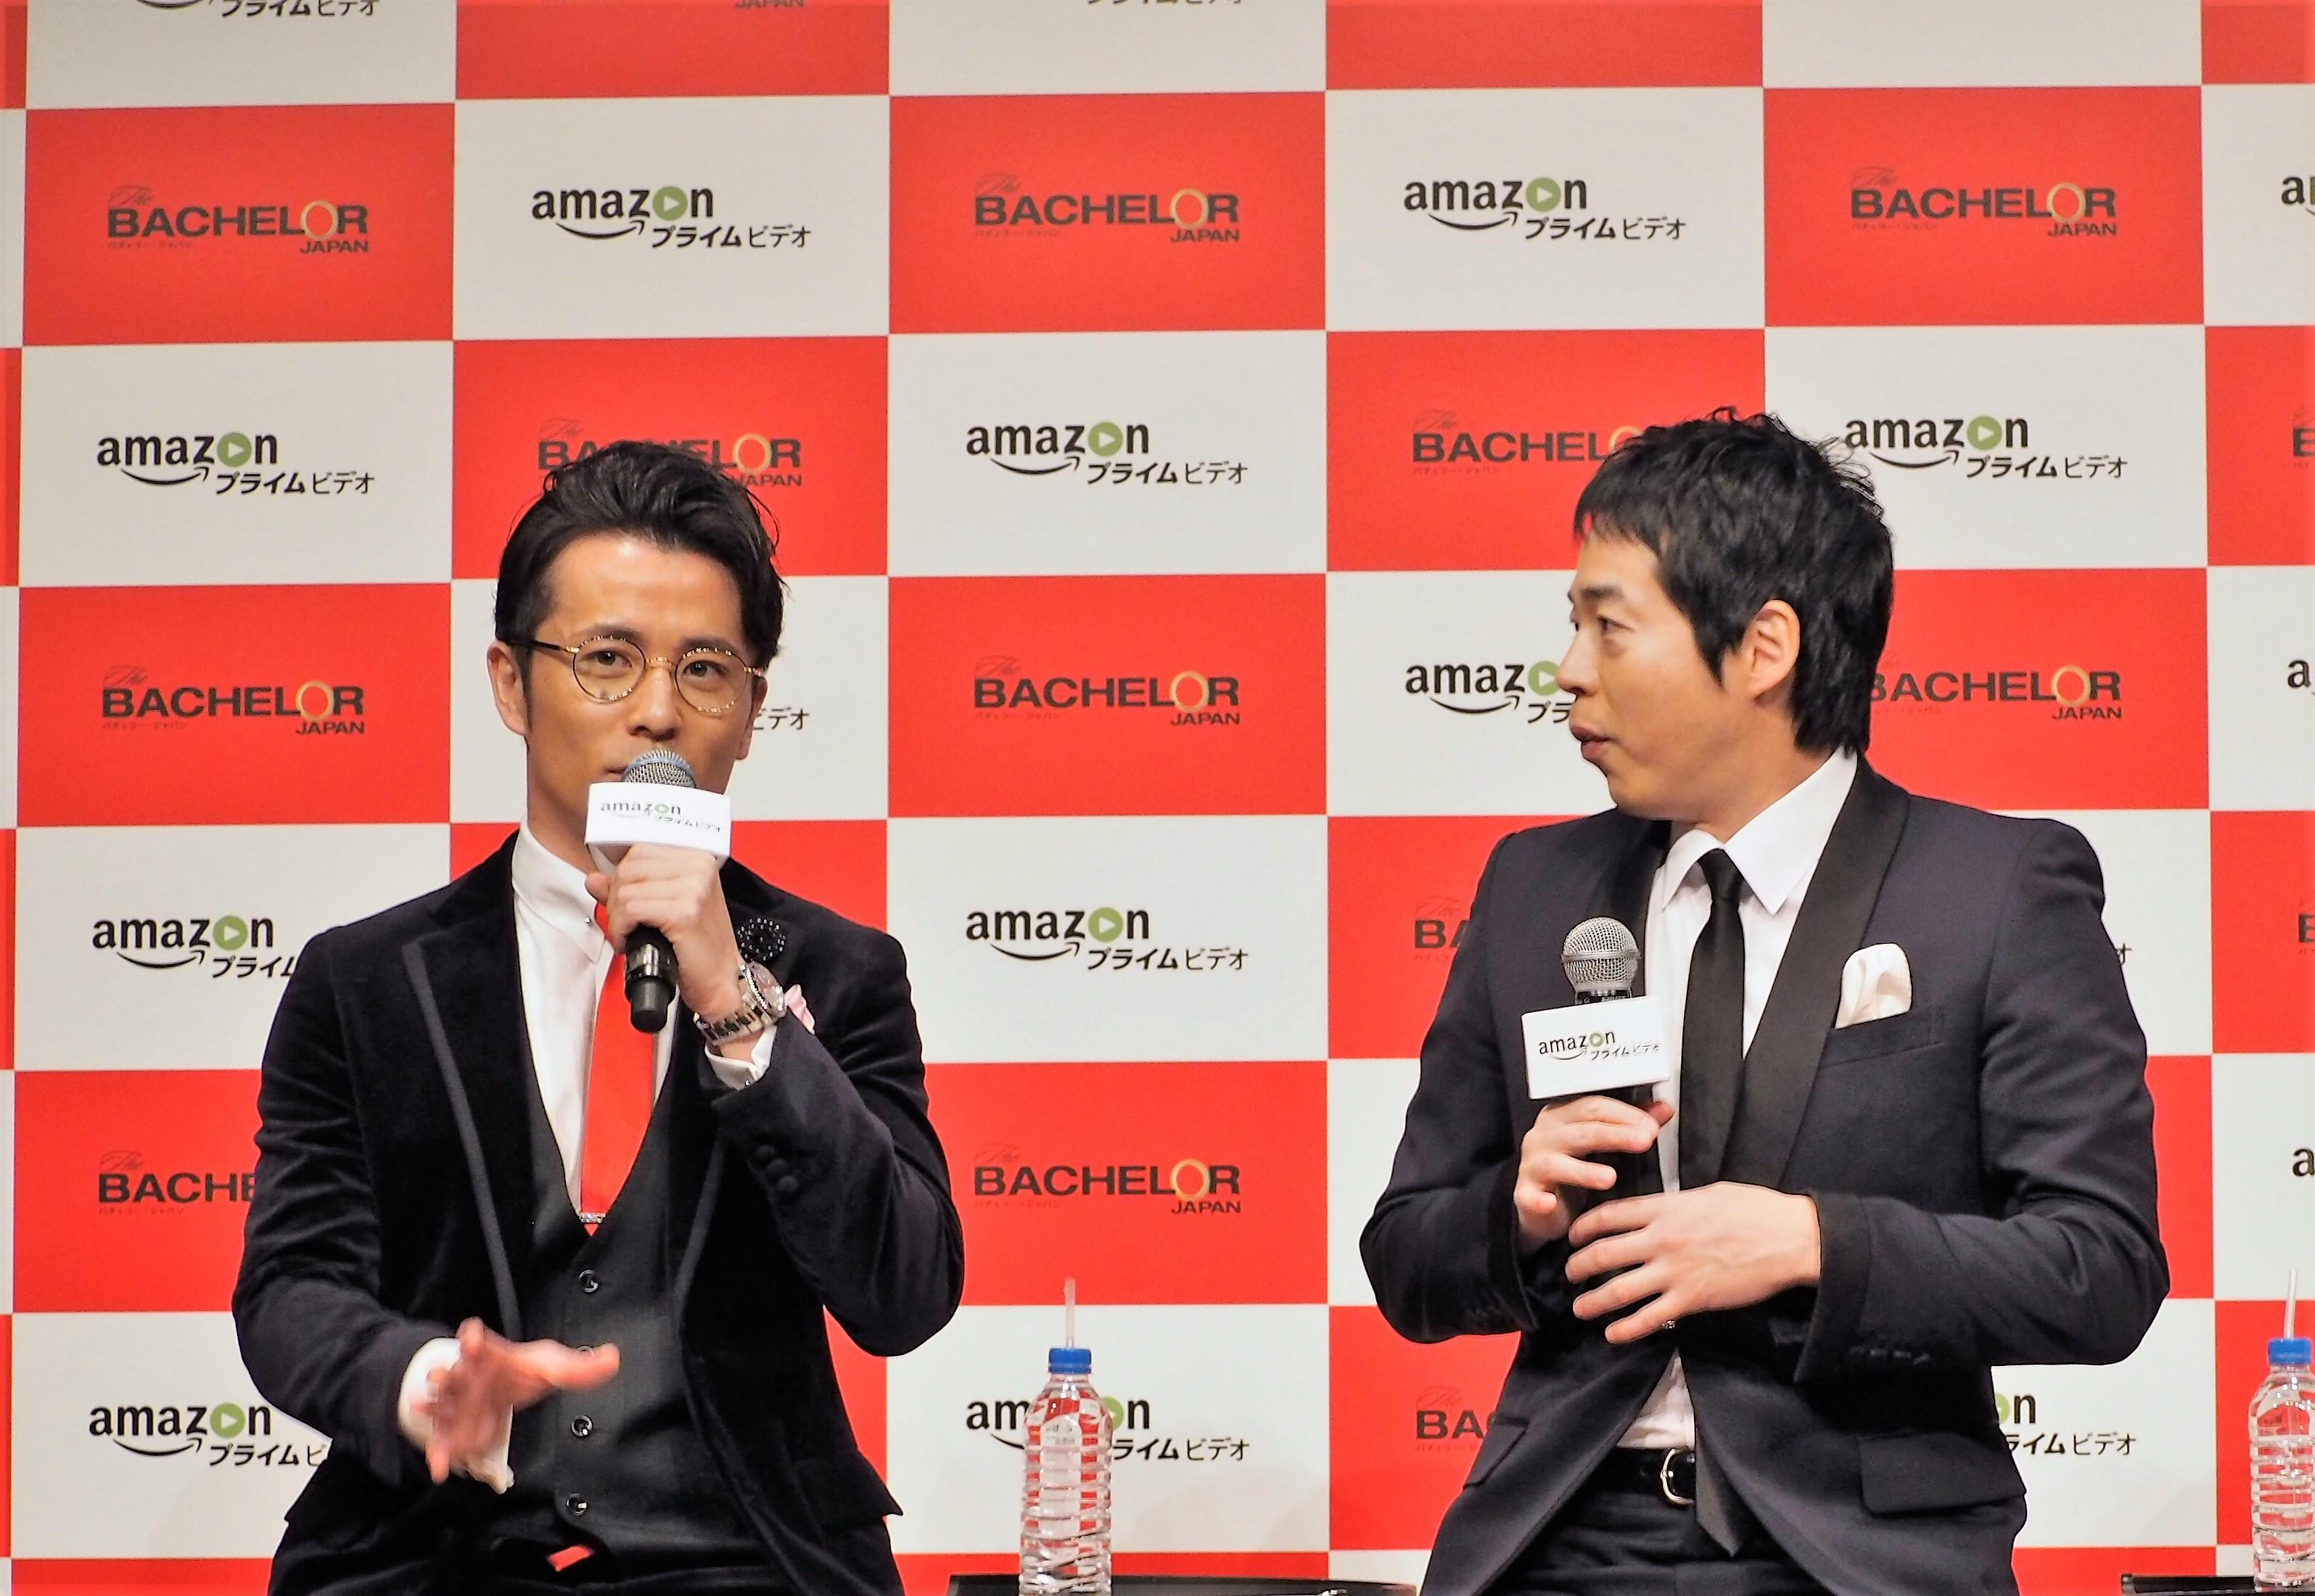 http://news.yoshimoto.co.jp/20171204164852-8f52782c5866308cbf82140187c420df43735064.jpg